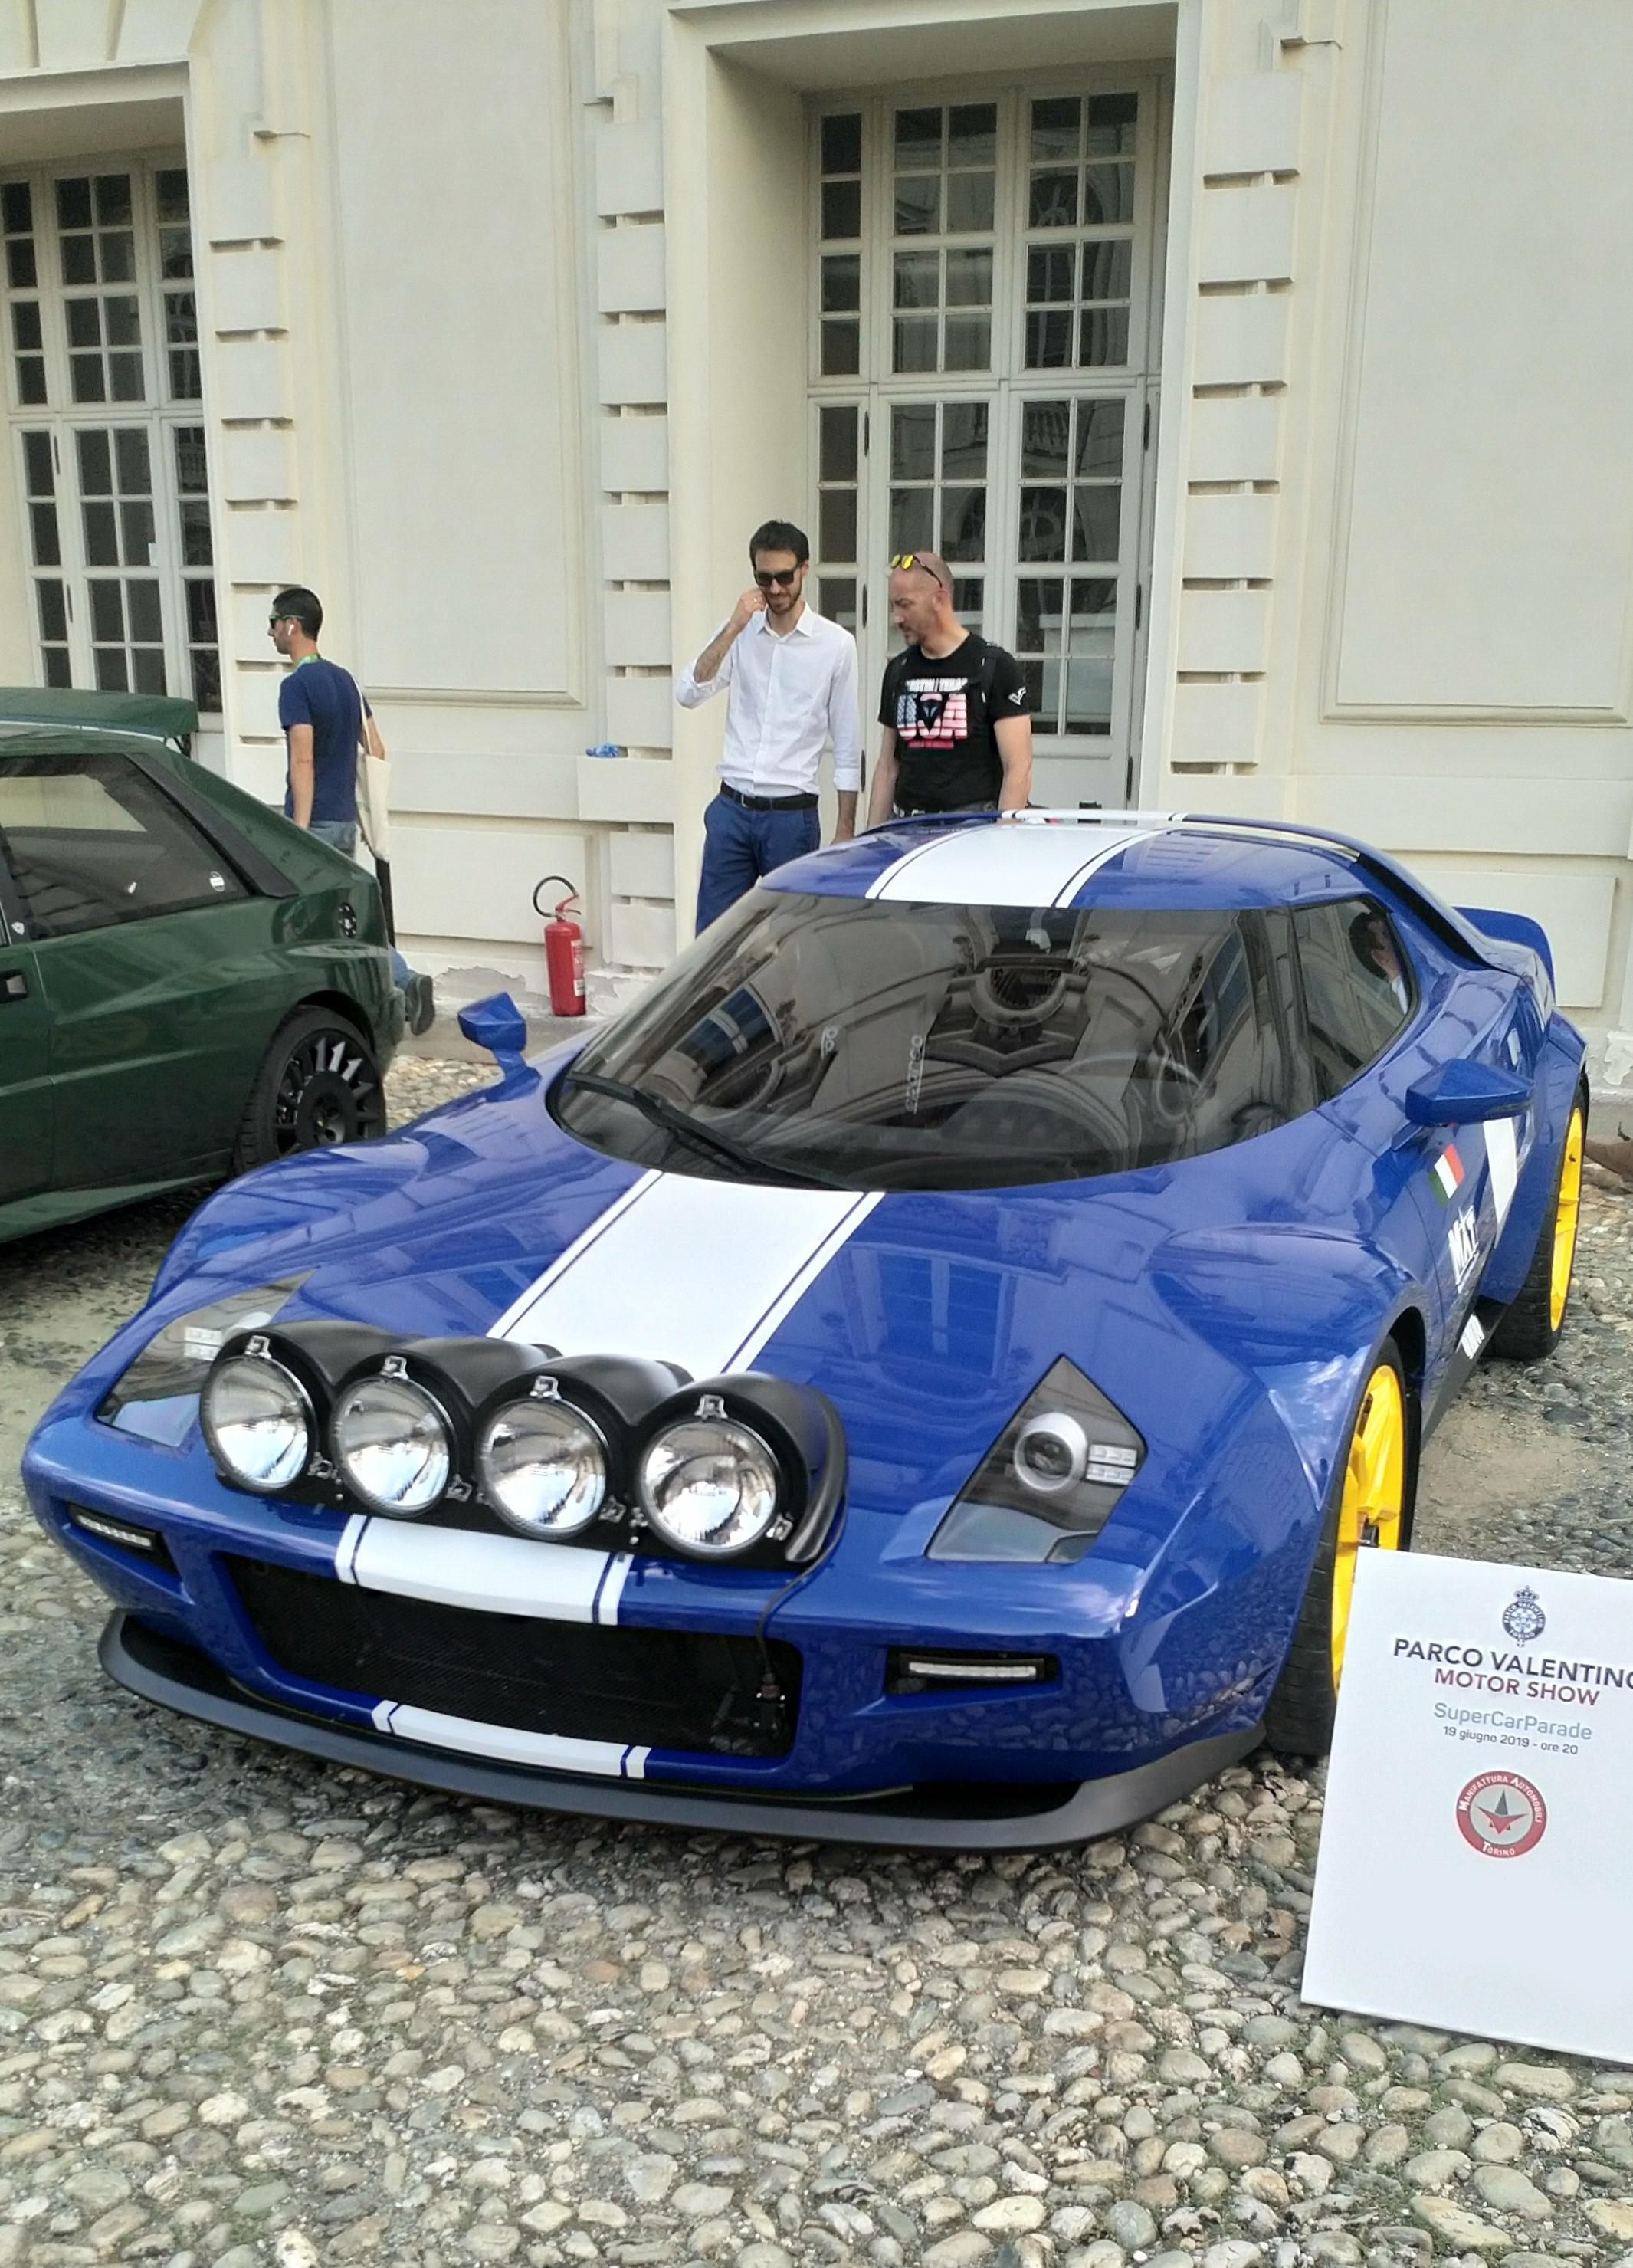 The New Lancia Stratos Unique Cars Super Cars Italian Cars